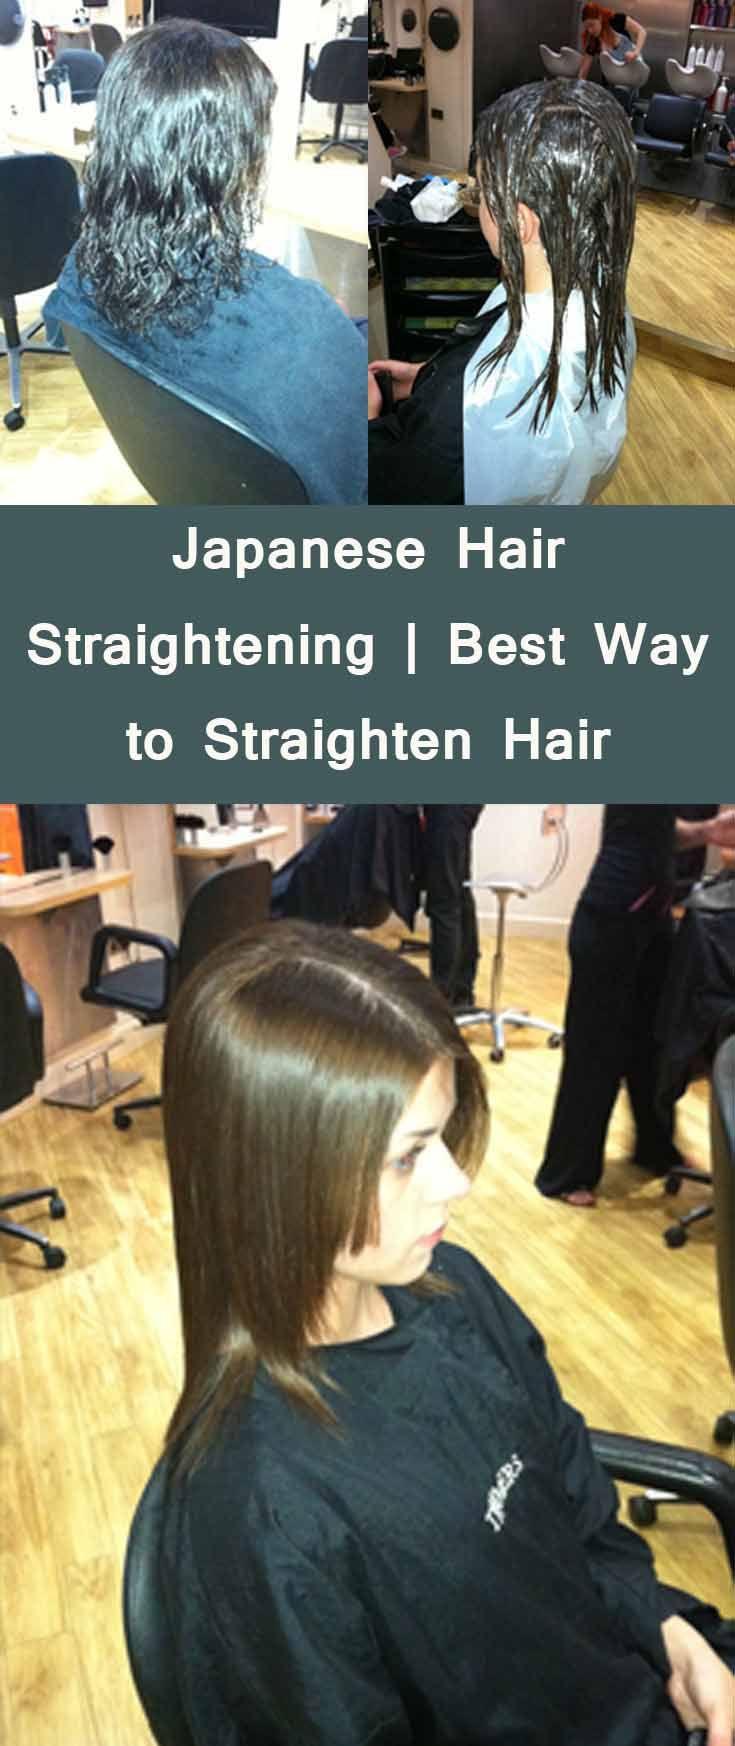 Japanese Hair Straightening Hair Straightening Ideas Pinterest